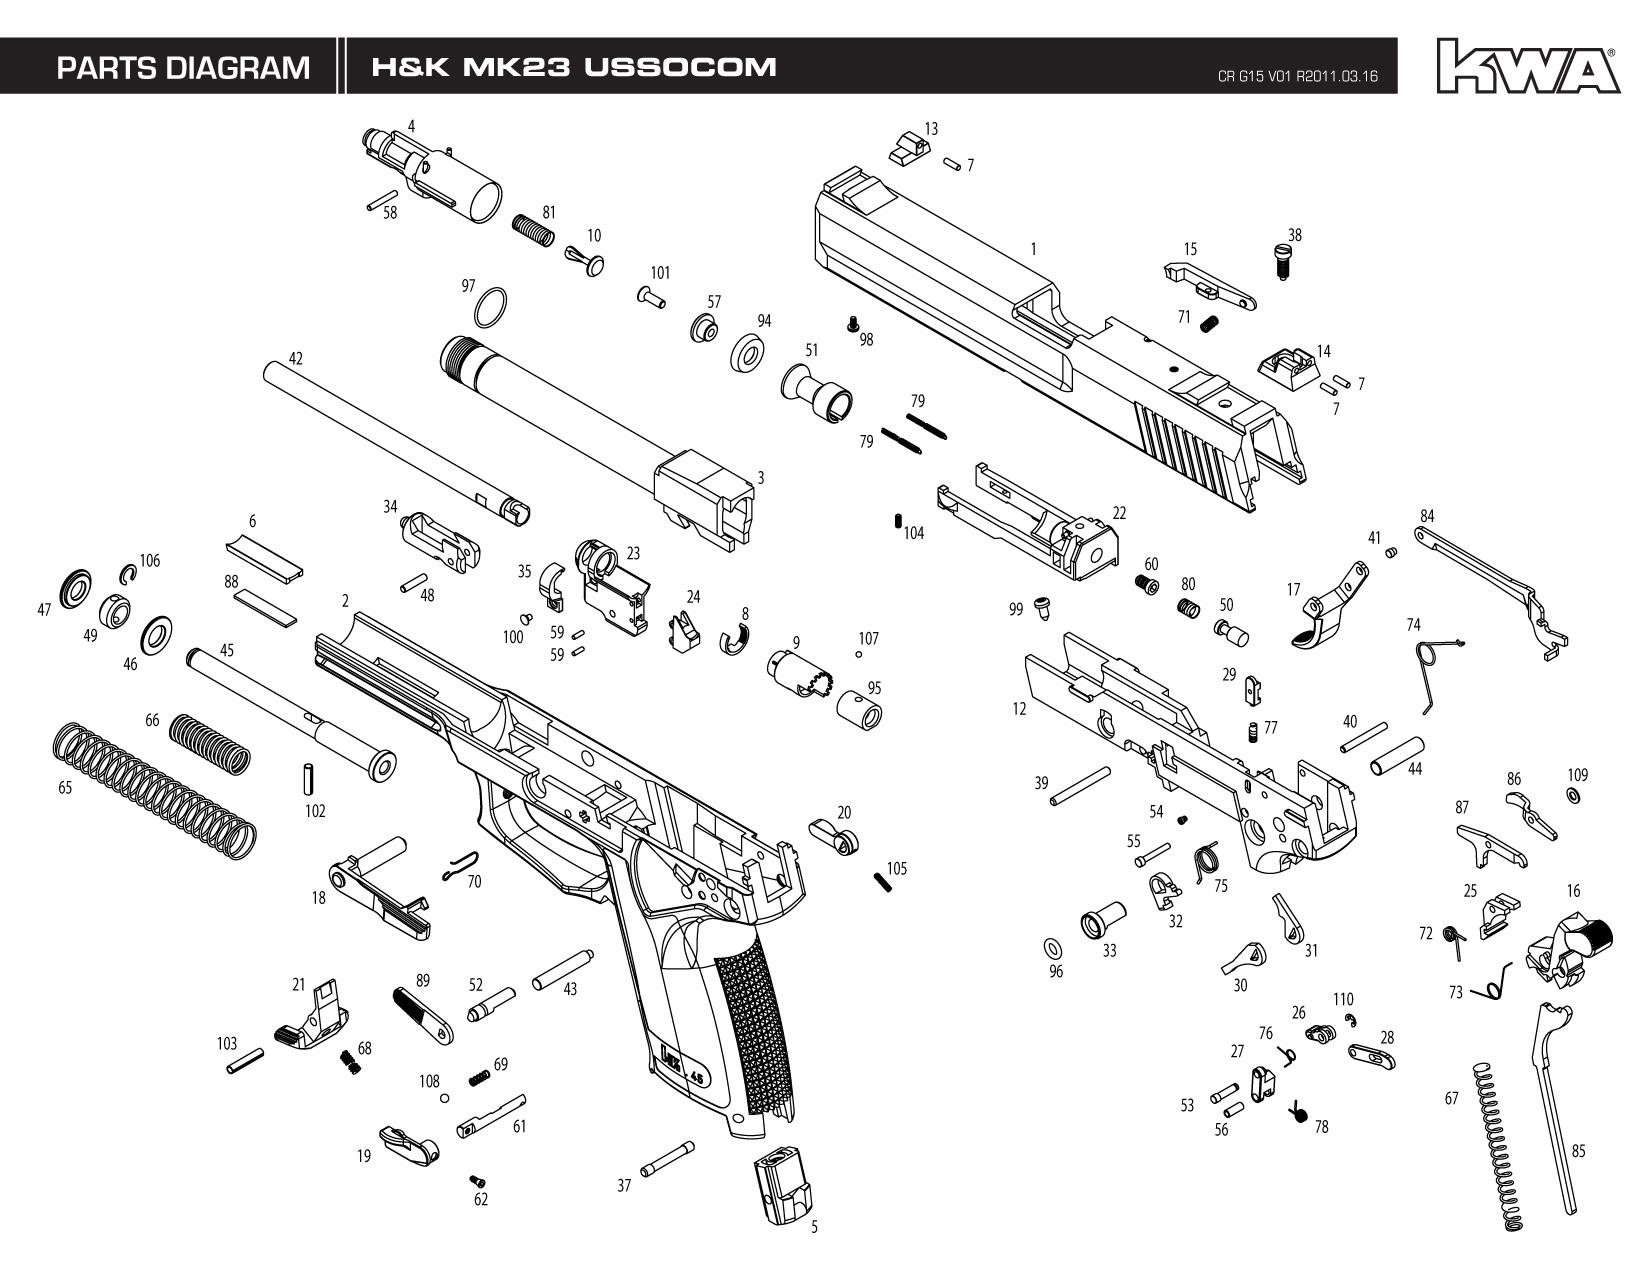 Umarex Colt Saa Parts List Diagram Steel Storm Replacement M4 Airsoft Rifle Wiring Diagrams Portal U2022 Force Disassembly Kwa Gun Manual H K Mk23